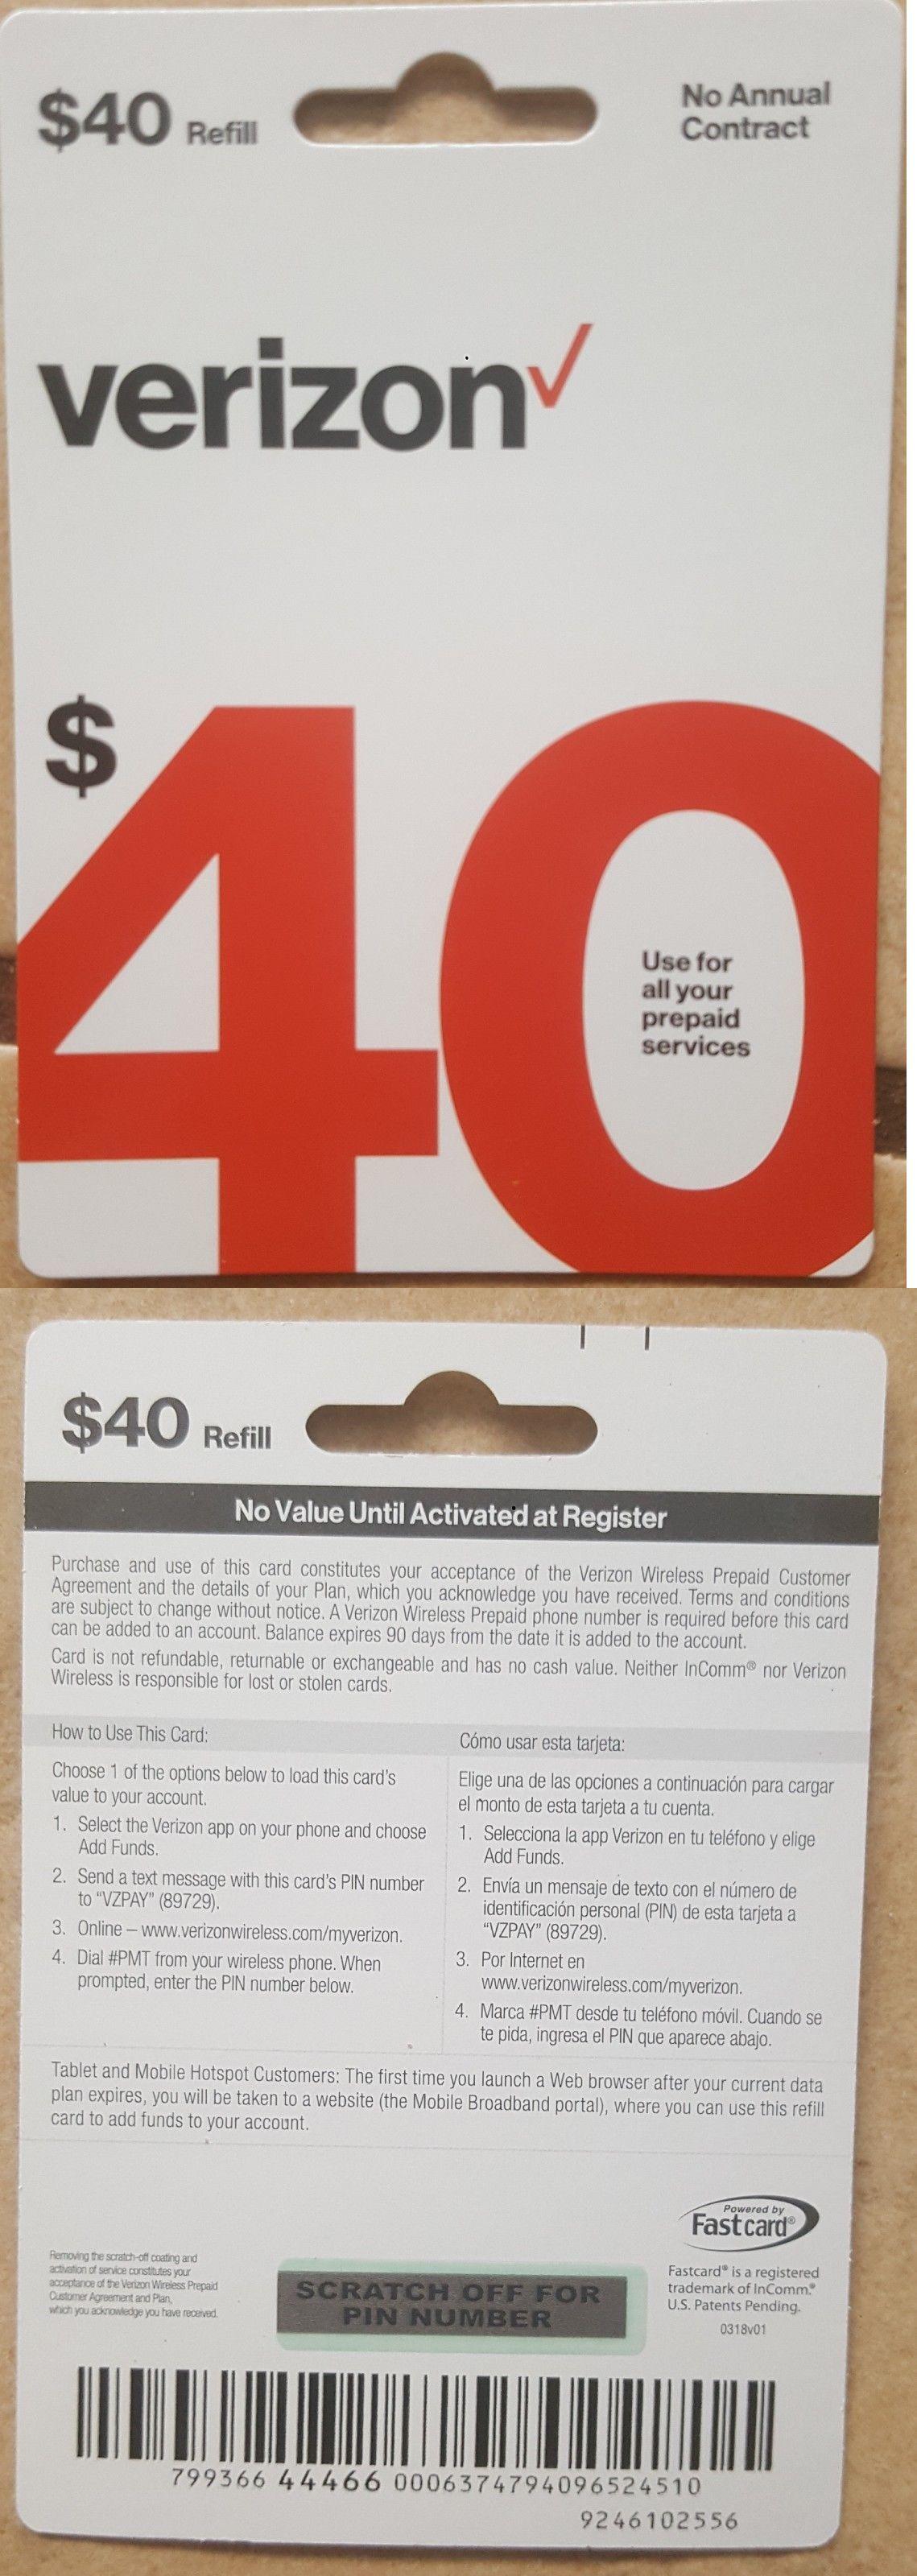 Phone And Data Cards 43308 40 Verizon Wireless Prepaid Refill